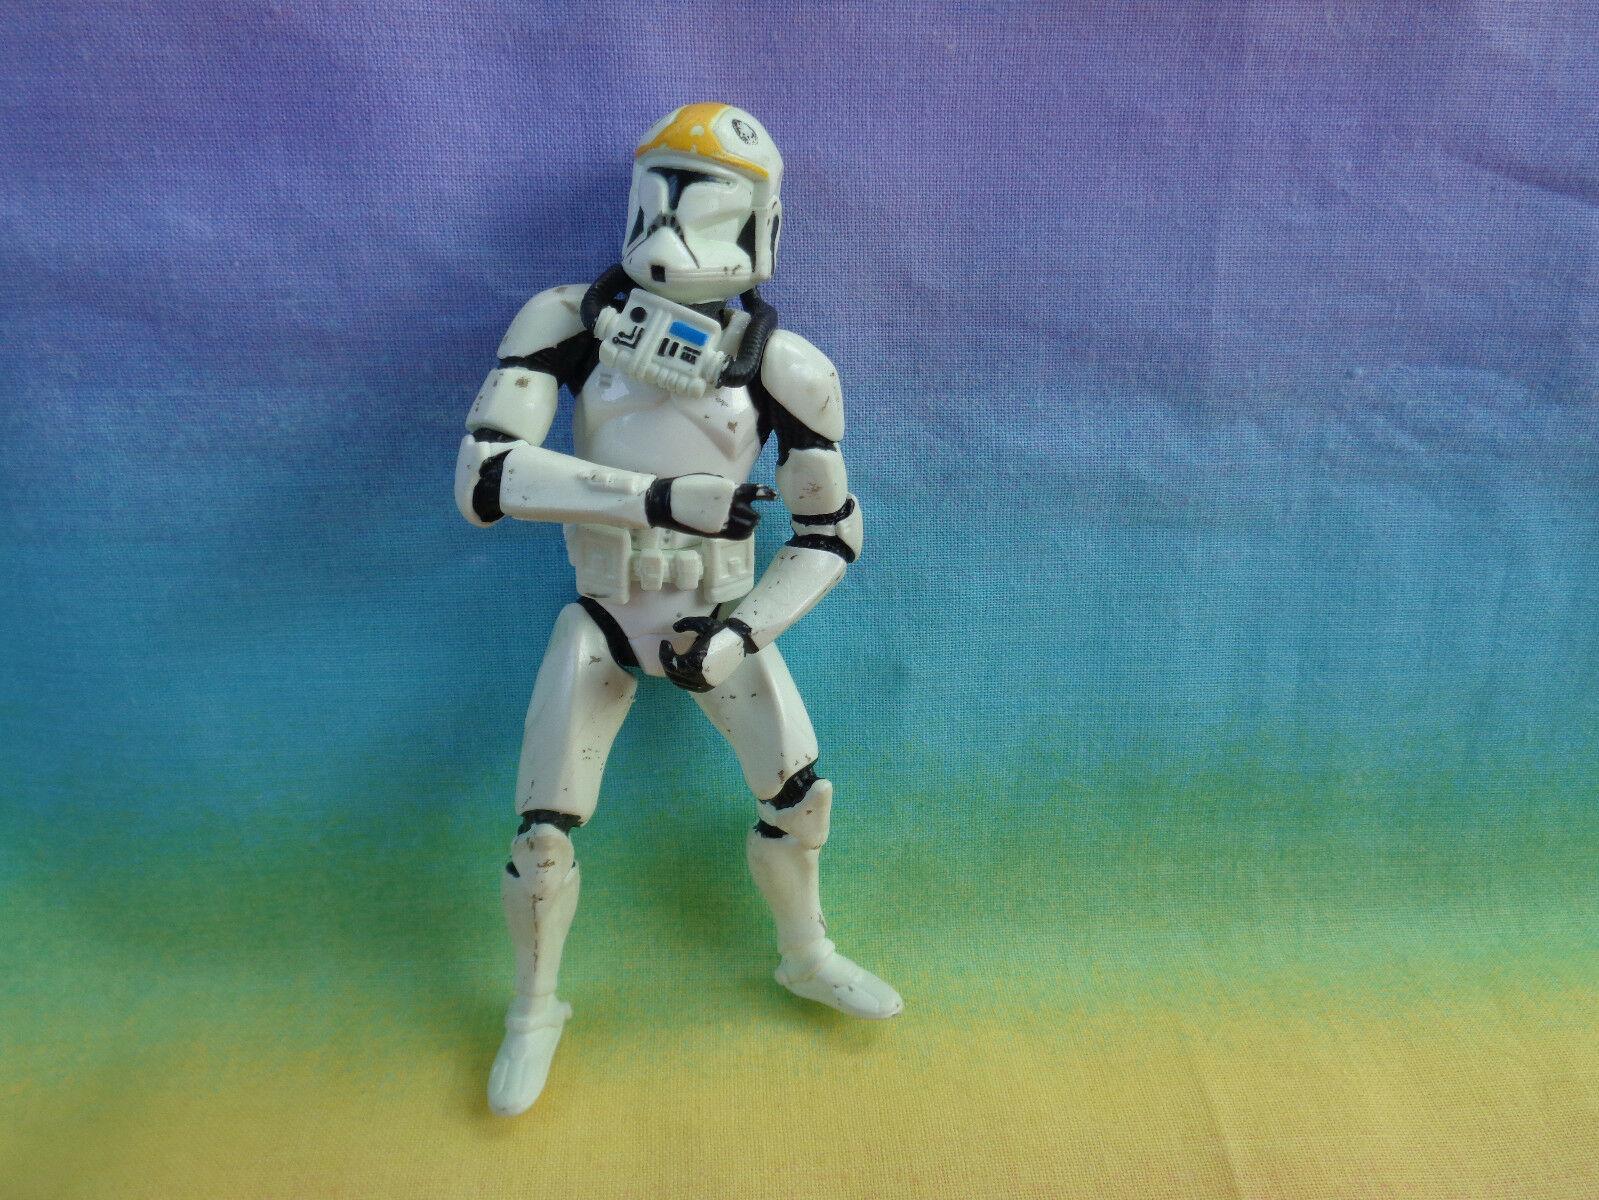 2000 Hasbro Star Wars Clone Trooper Action Figure - as is